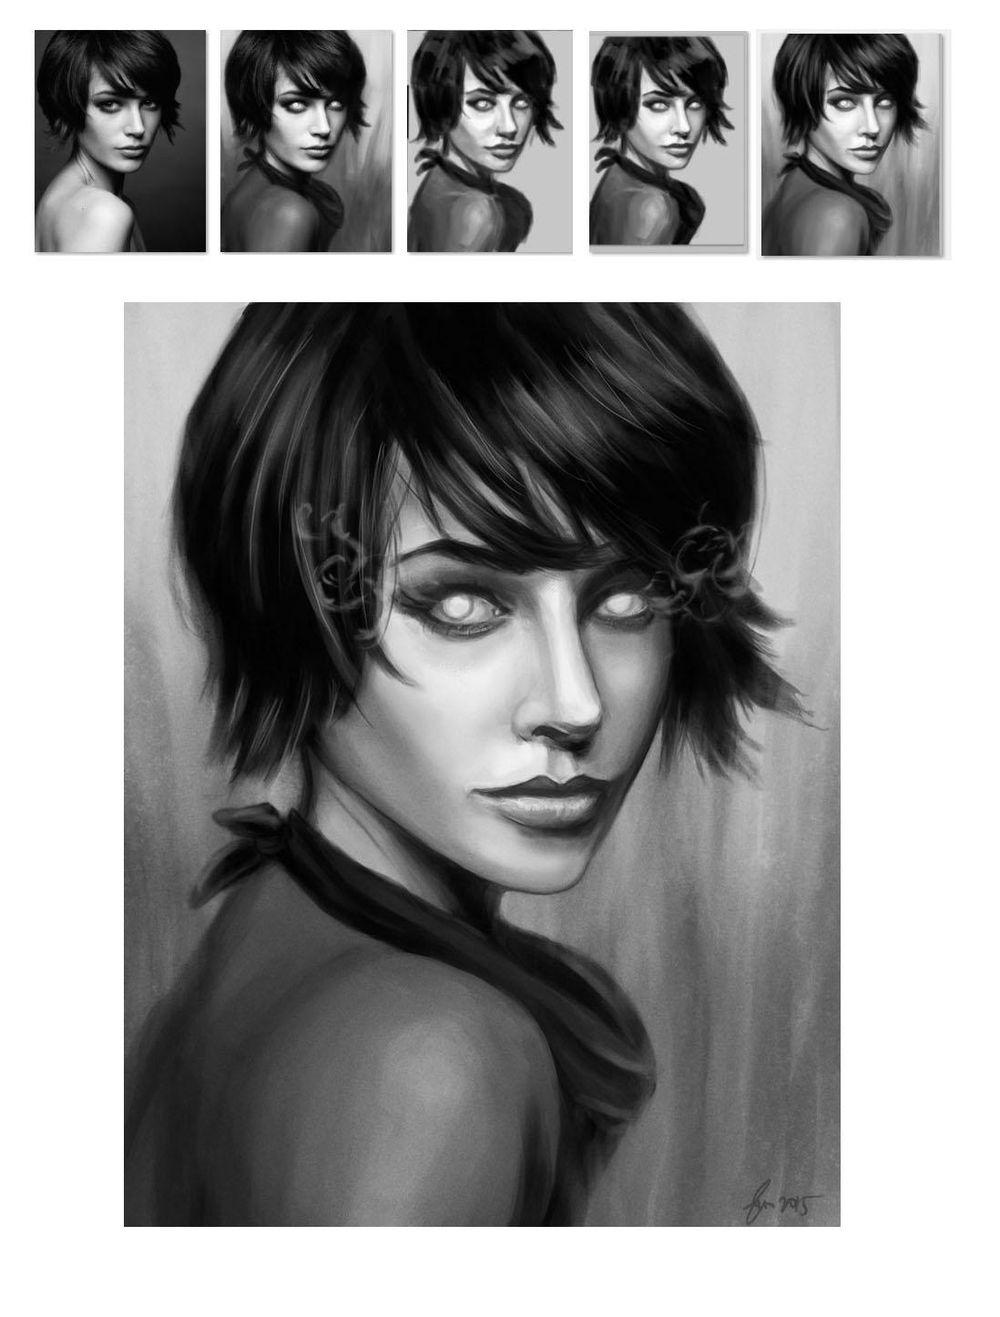 Portrait Painting - image 15 - student project